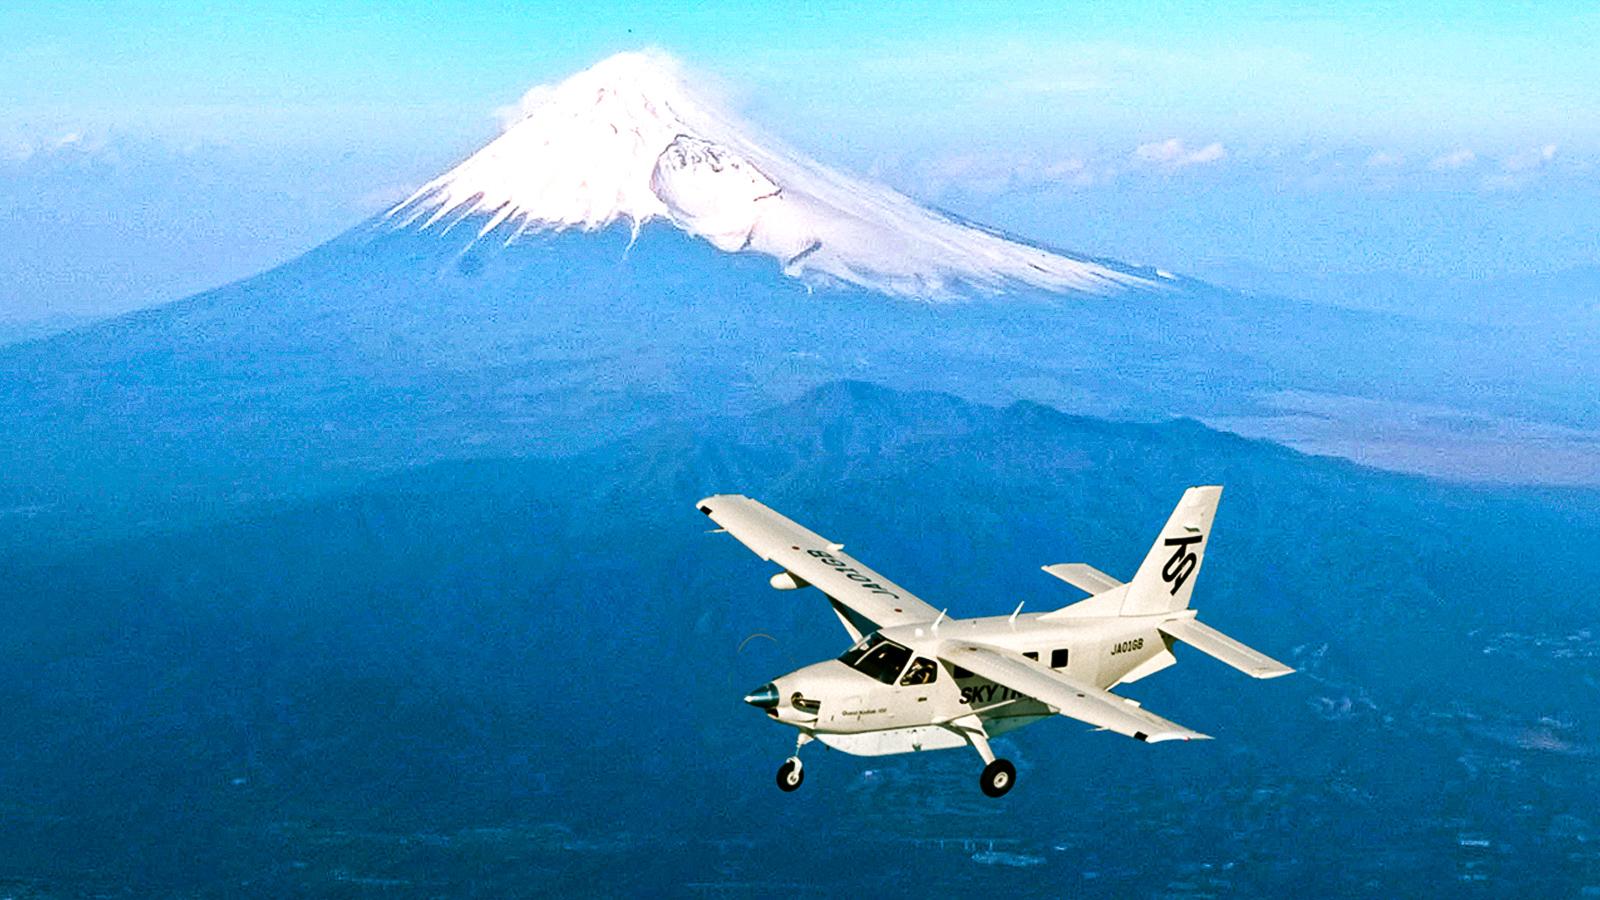 Half-Day Flight Tour of Mt. Fuji & Shinjuku from Tokyo